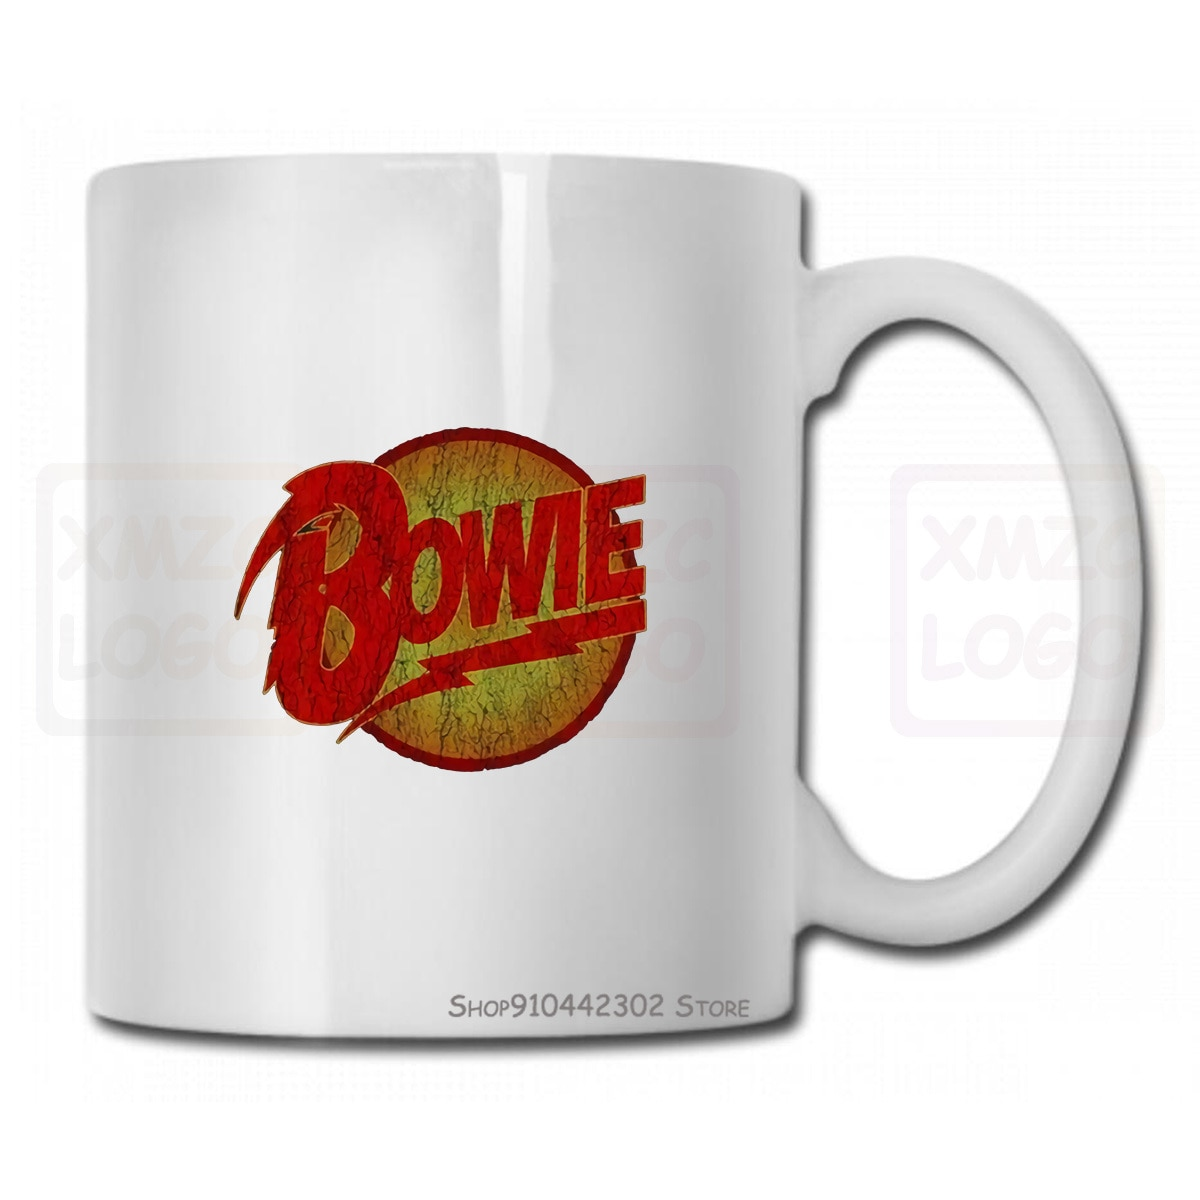 David Bowie, nuevo tazón taza trueno para hombre, Reina, Mickey Jagger, Lou, Reed, Lennon, hombres y mujeres